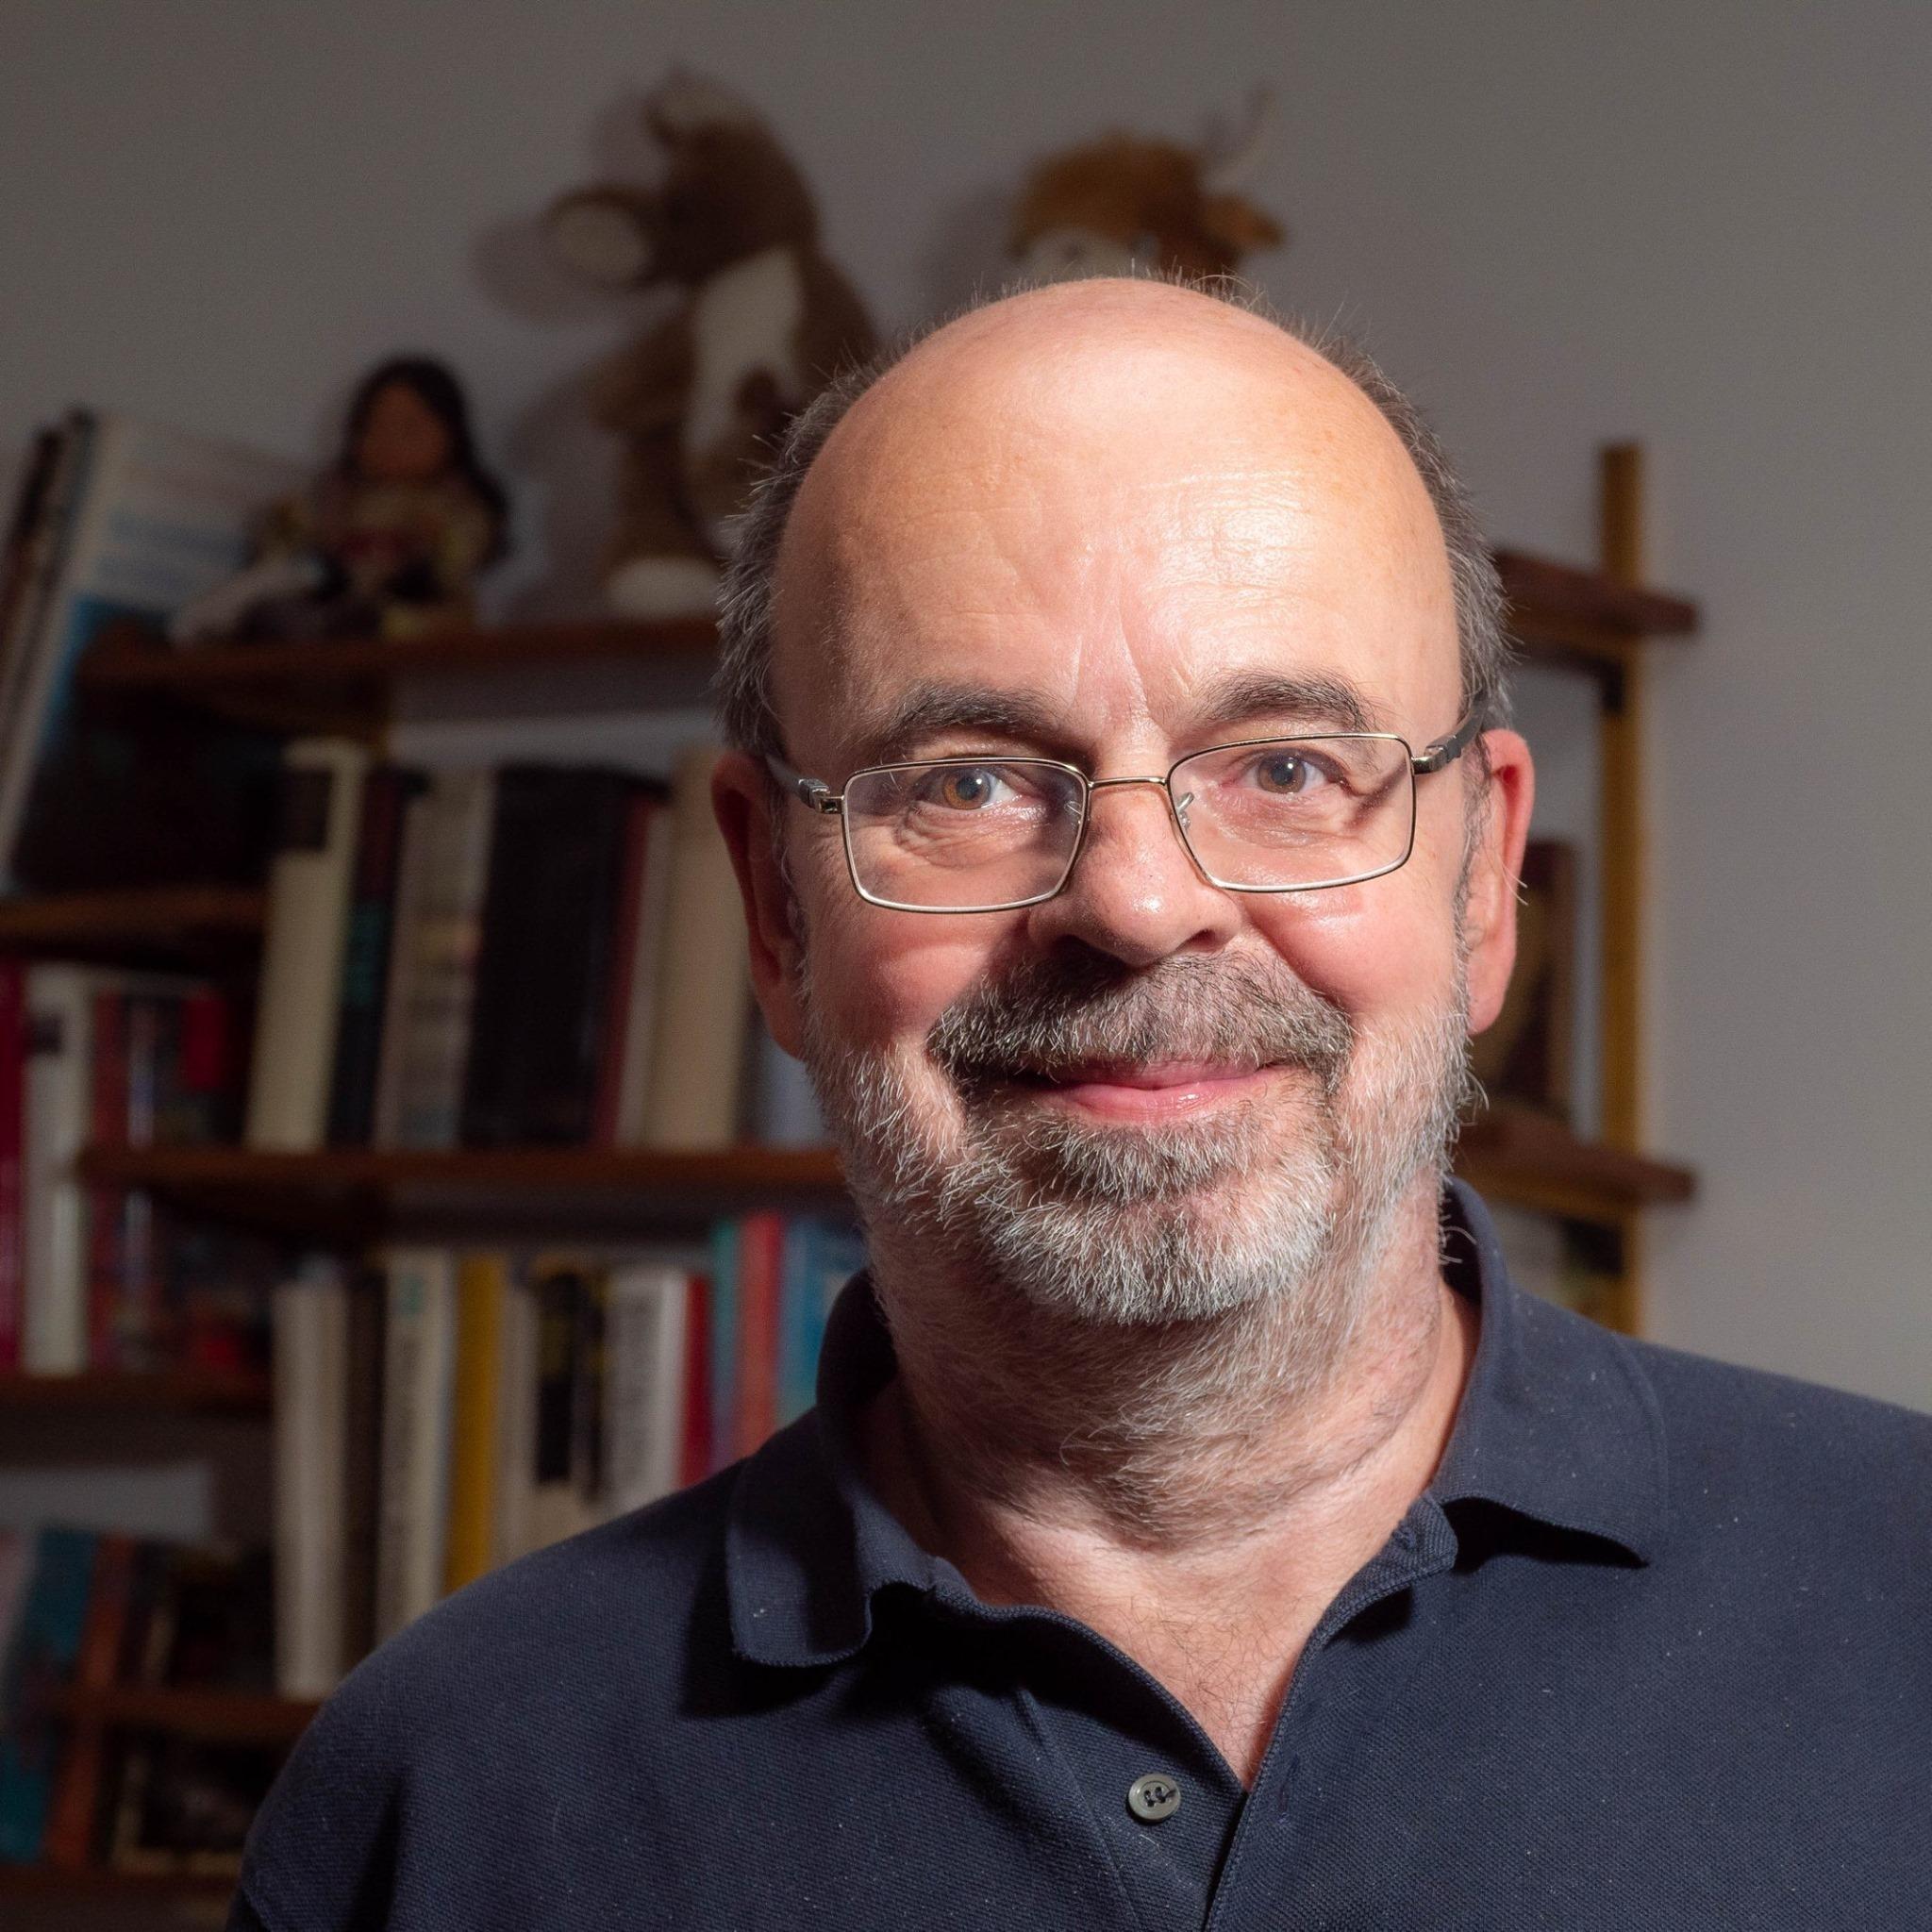 2021-04-26 | Interview mit dem Pharmakologen Bernd Mayer